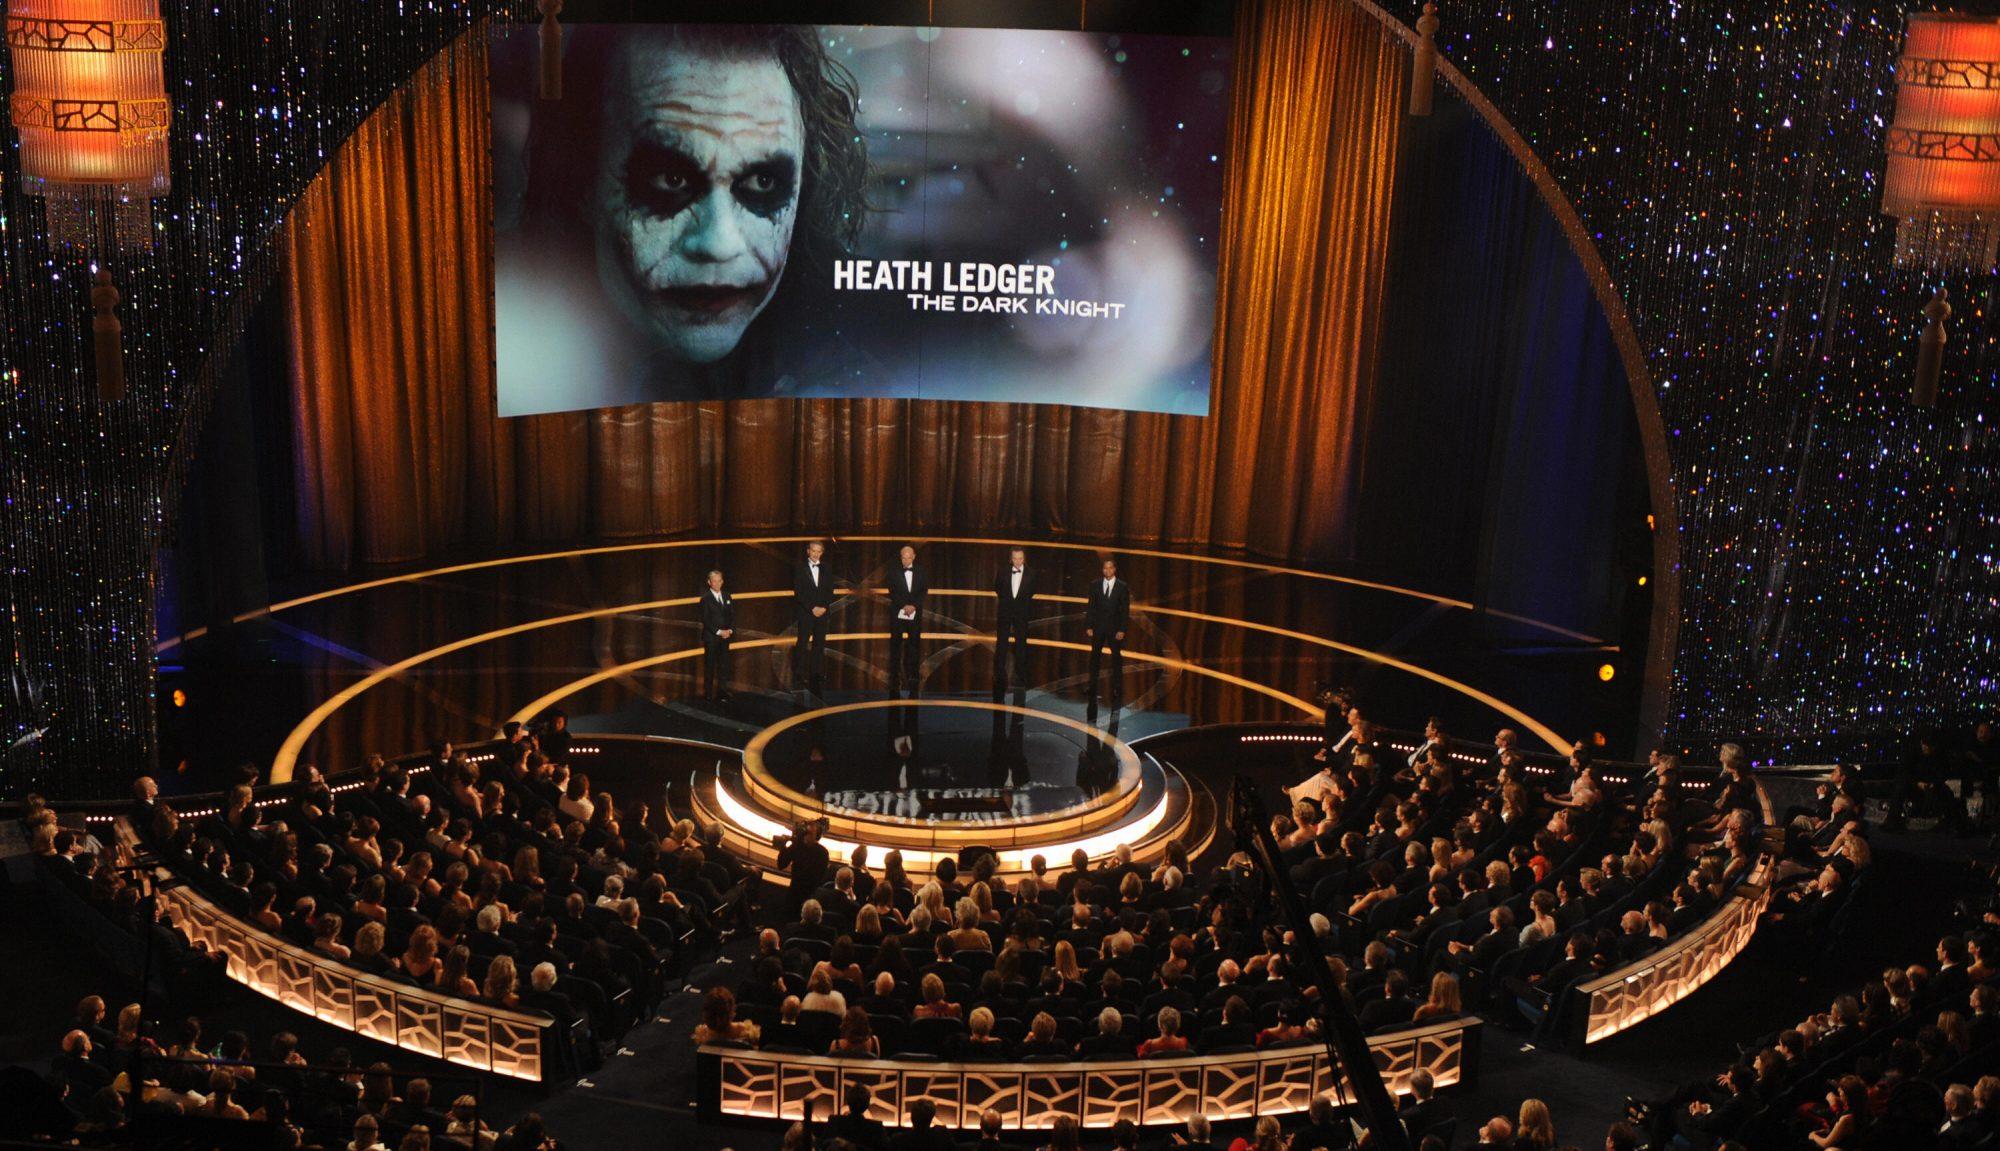 heath-ledger-the-dark-knight-awards-season.jpg